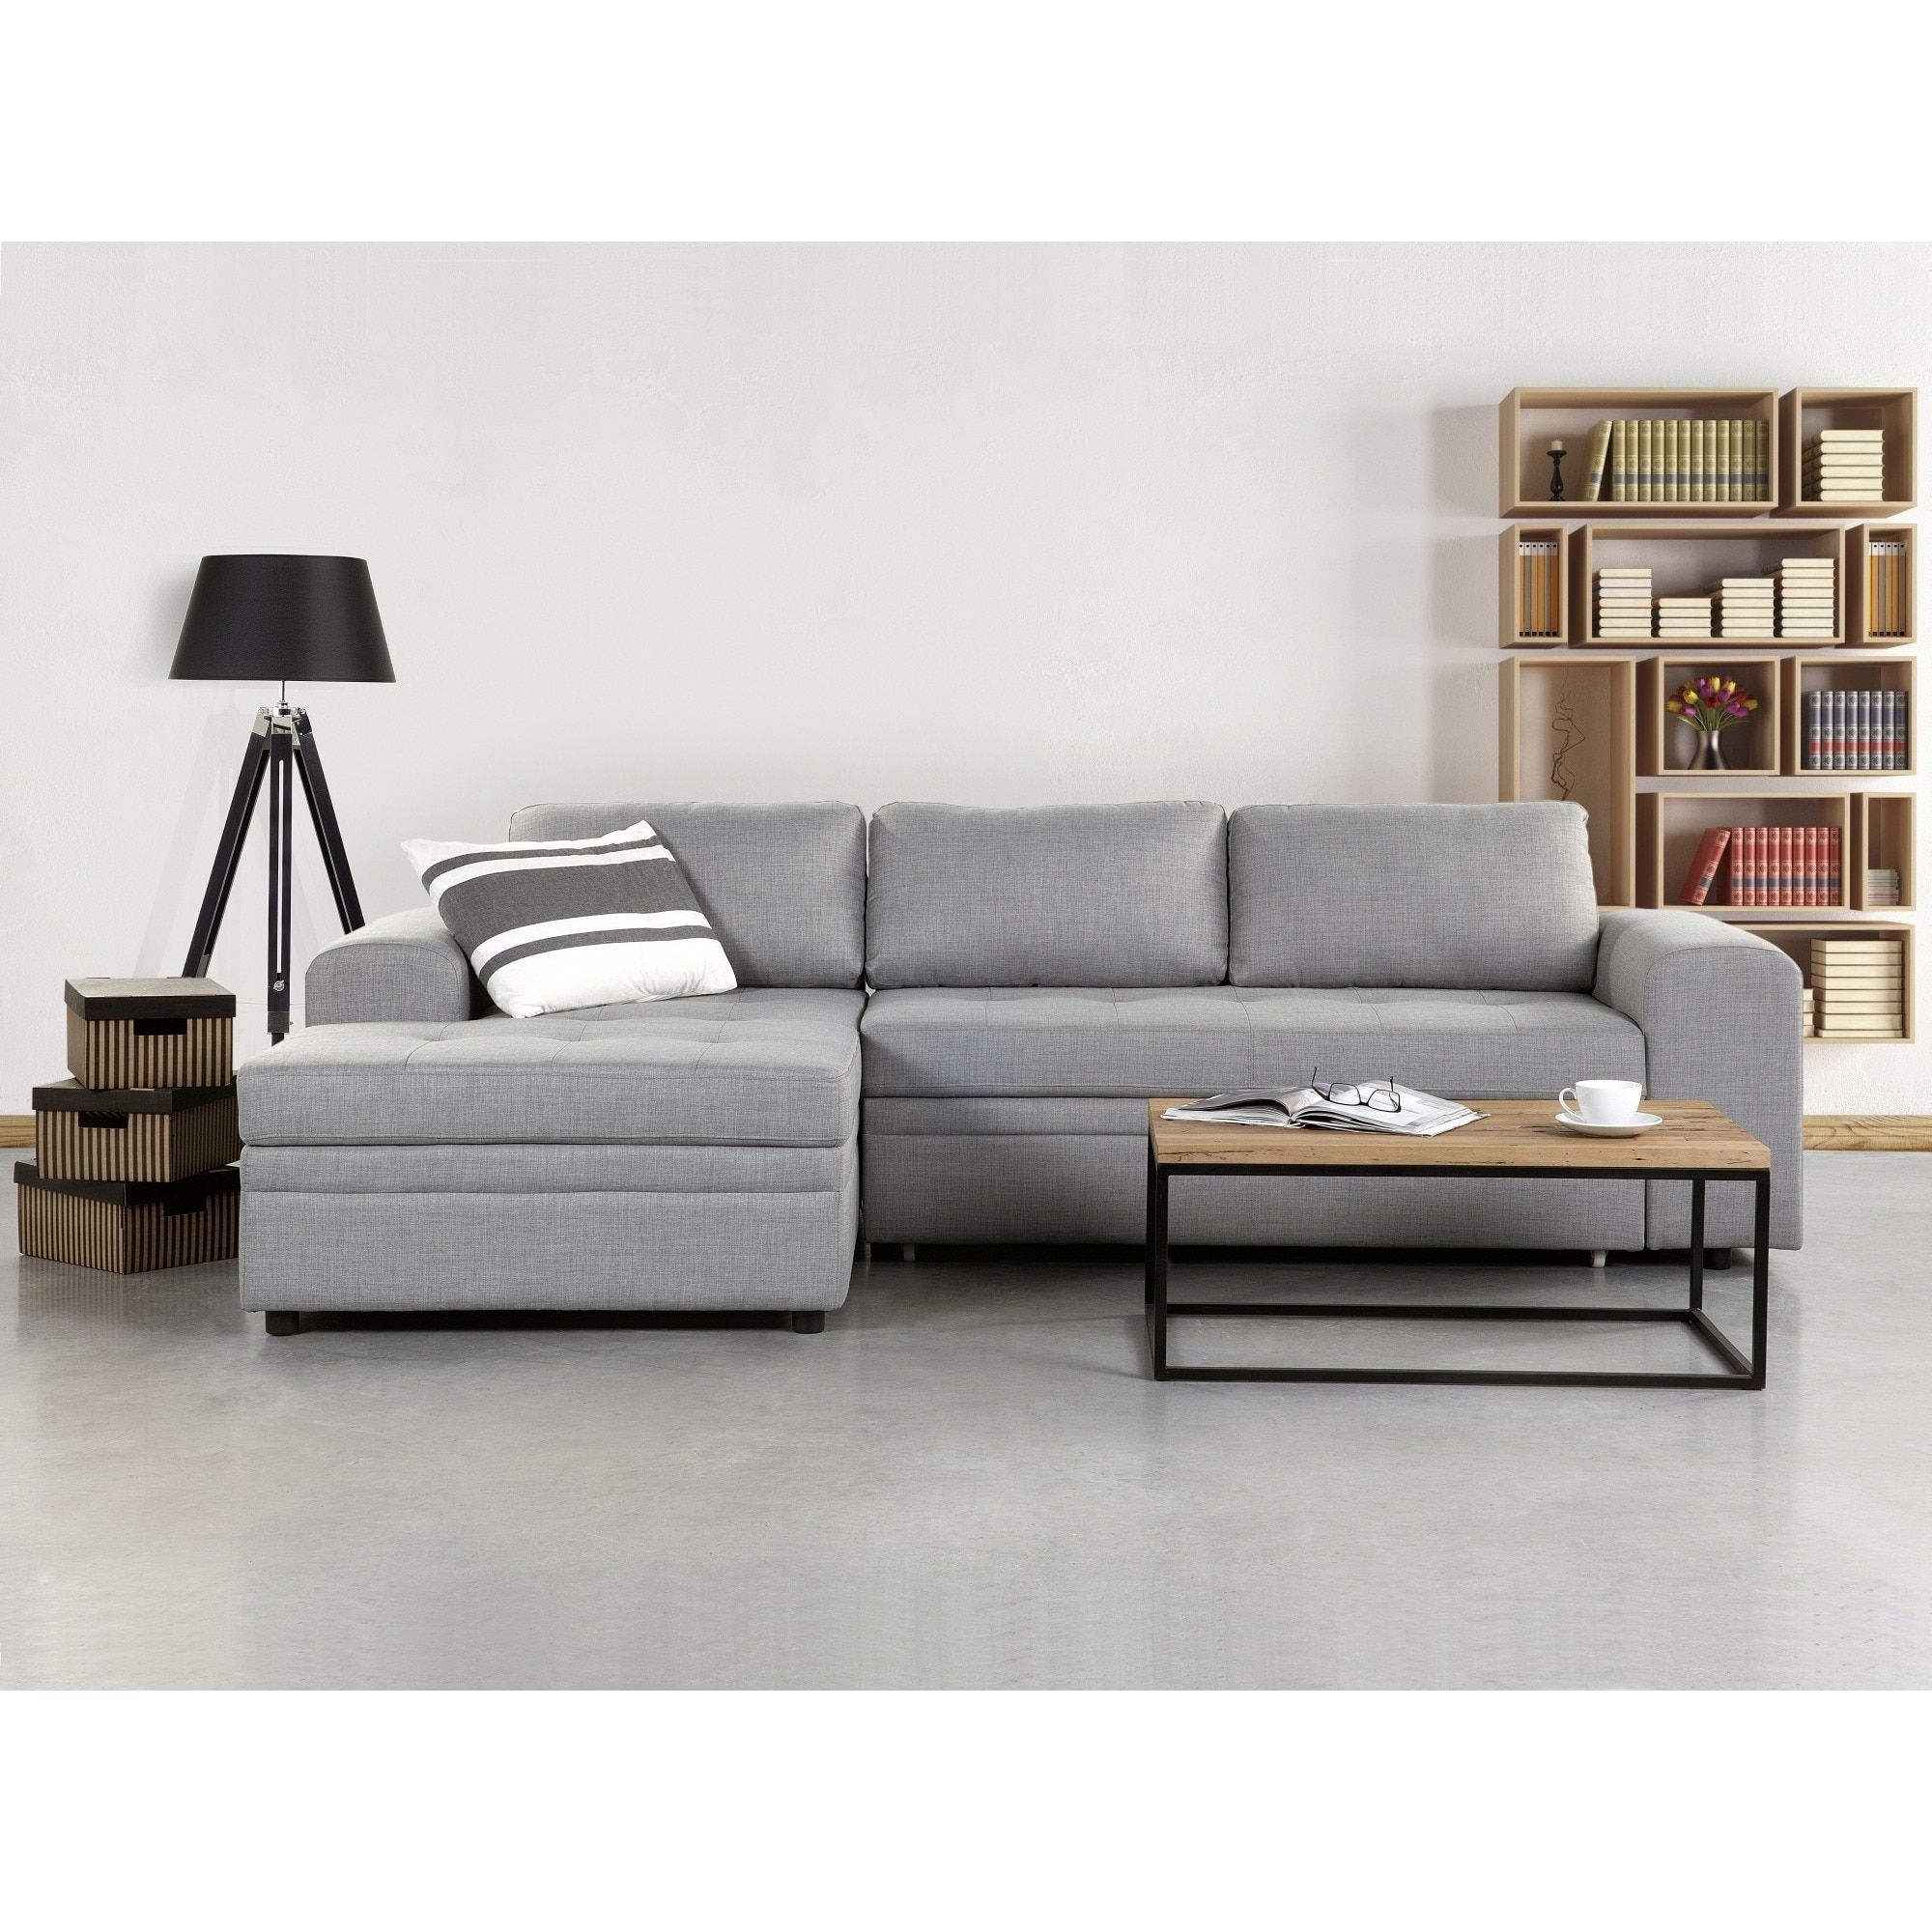 Kiruna Grey Upholstered Sleeper Sectional Sofa with Storage by Velago